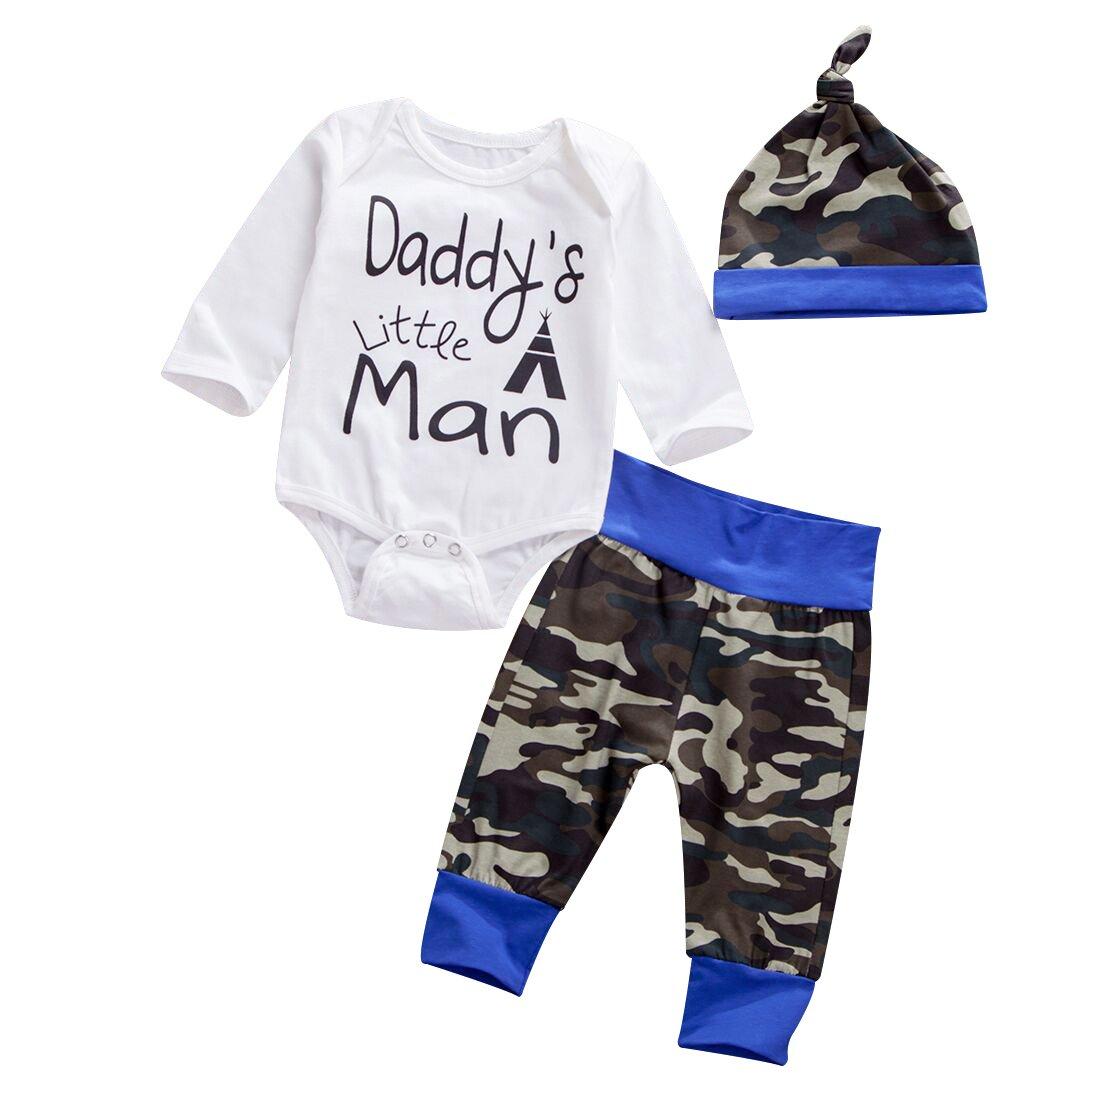 bd65a3722 Emmababy Newborn Daddy s Little Man Print Baby Boys Girls Romper + ...